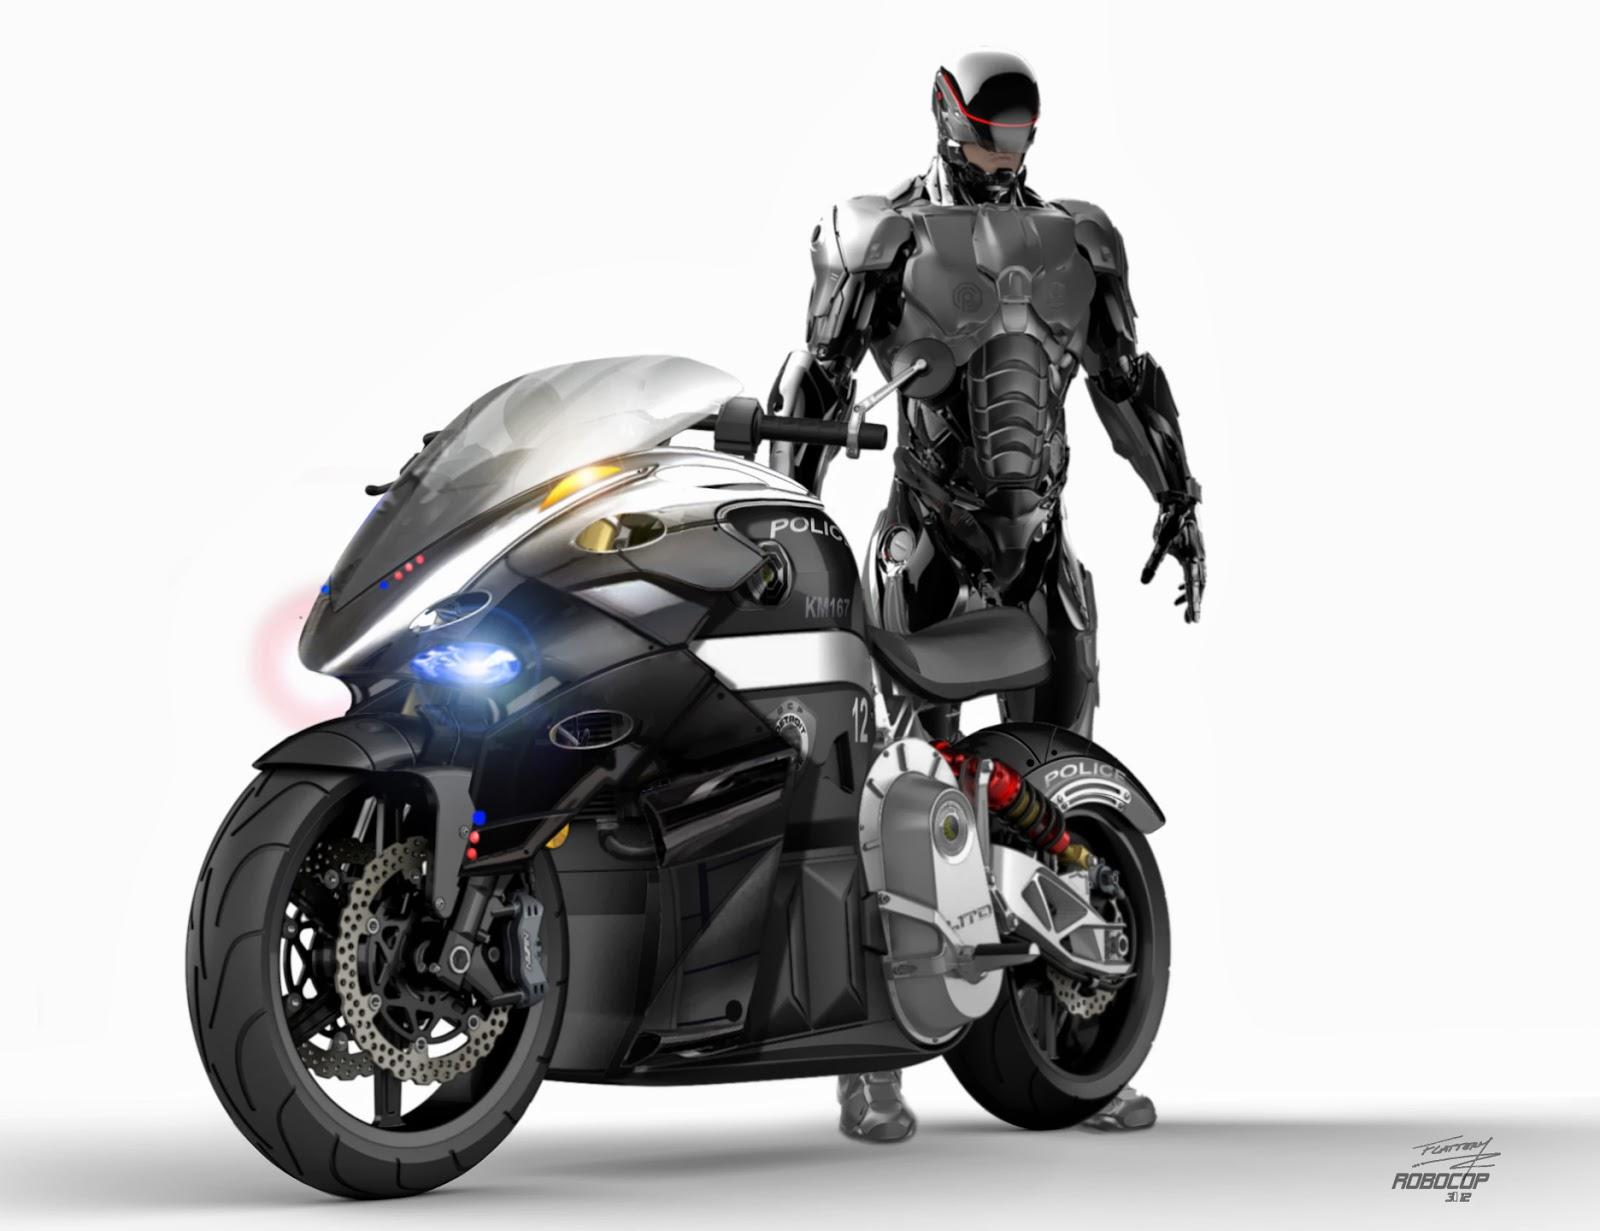 smokin robocop 2014 motorcycle concept art by tim